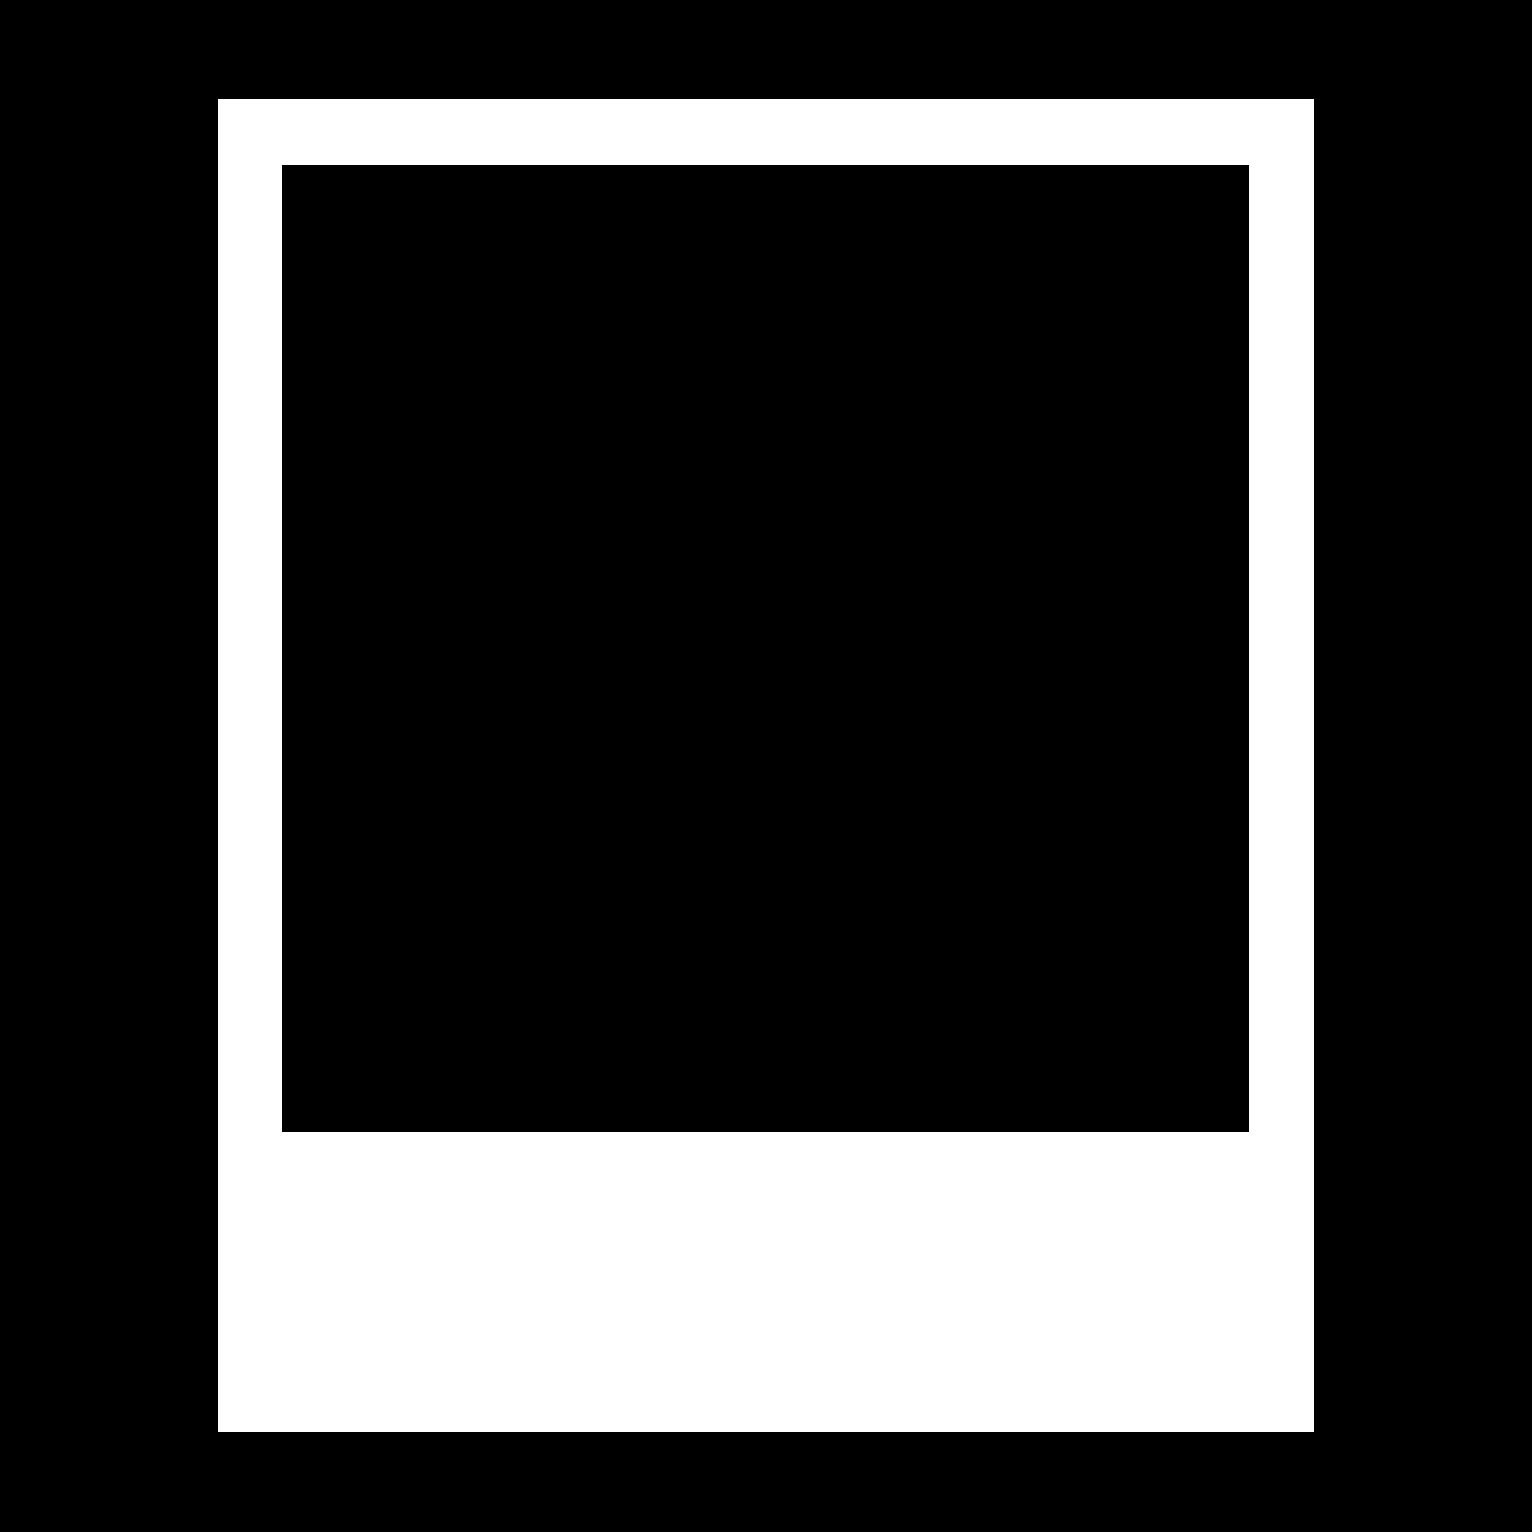 polaroid frame template overlay transparent. Black Bedroom Furniture Sets. Home Design Ideas